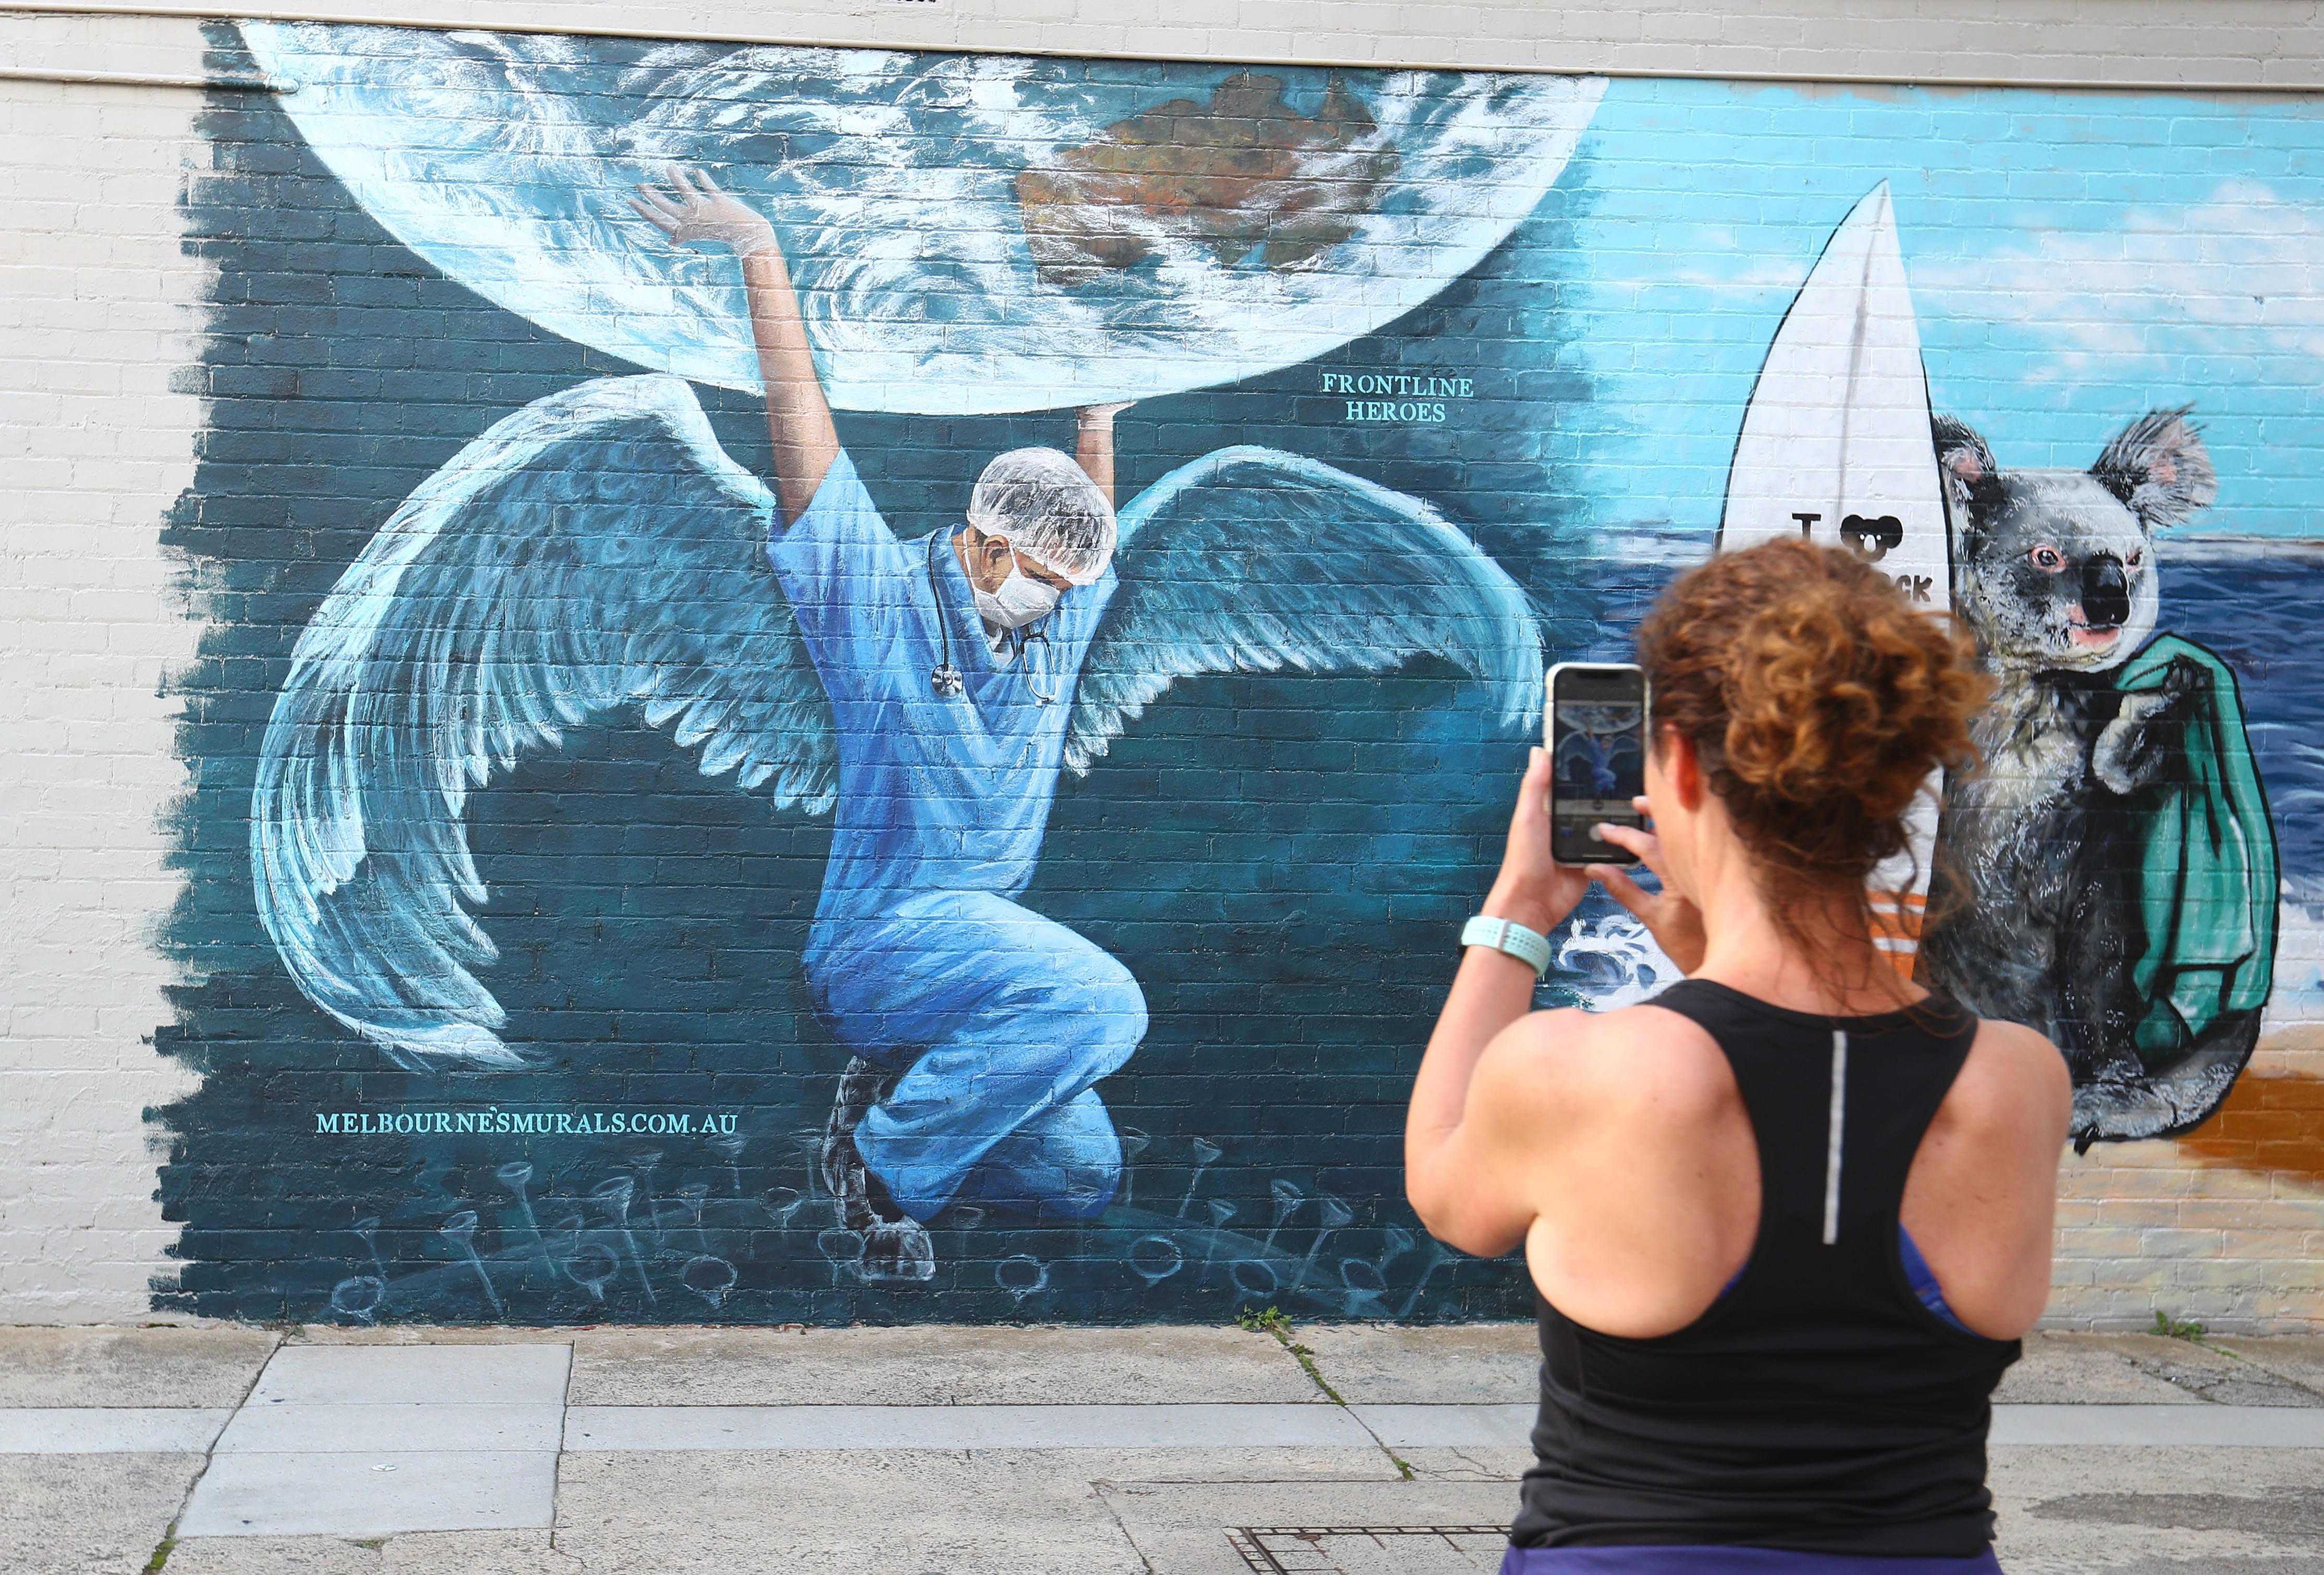 Coronavirus Themed Murals Continue To Pop Up Around The World